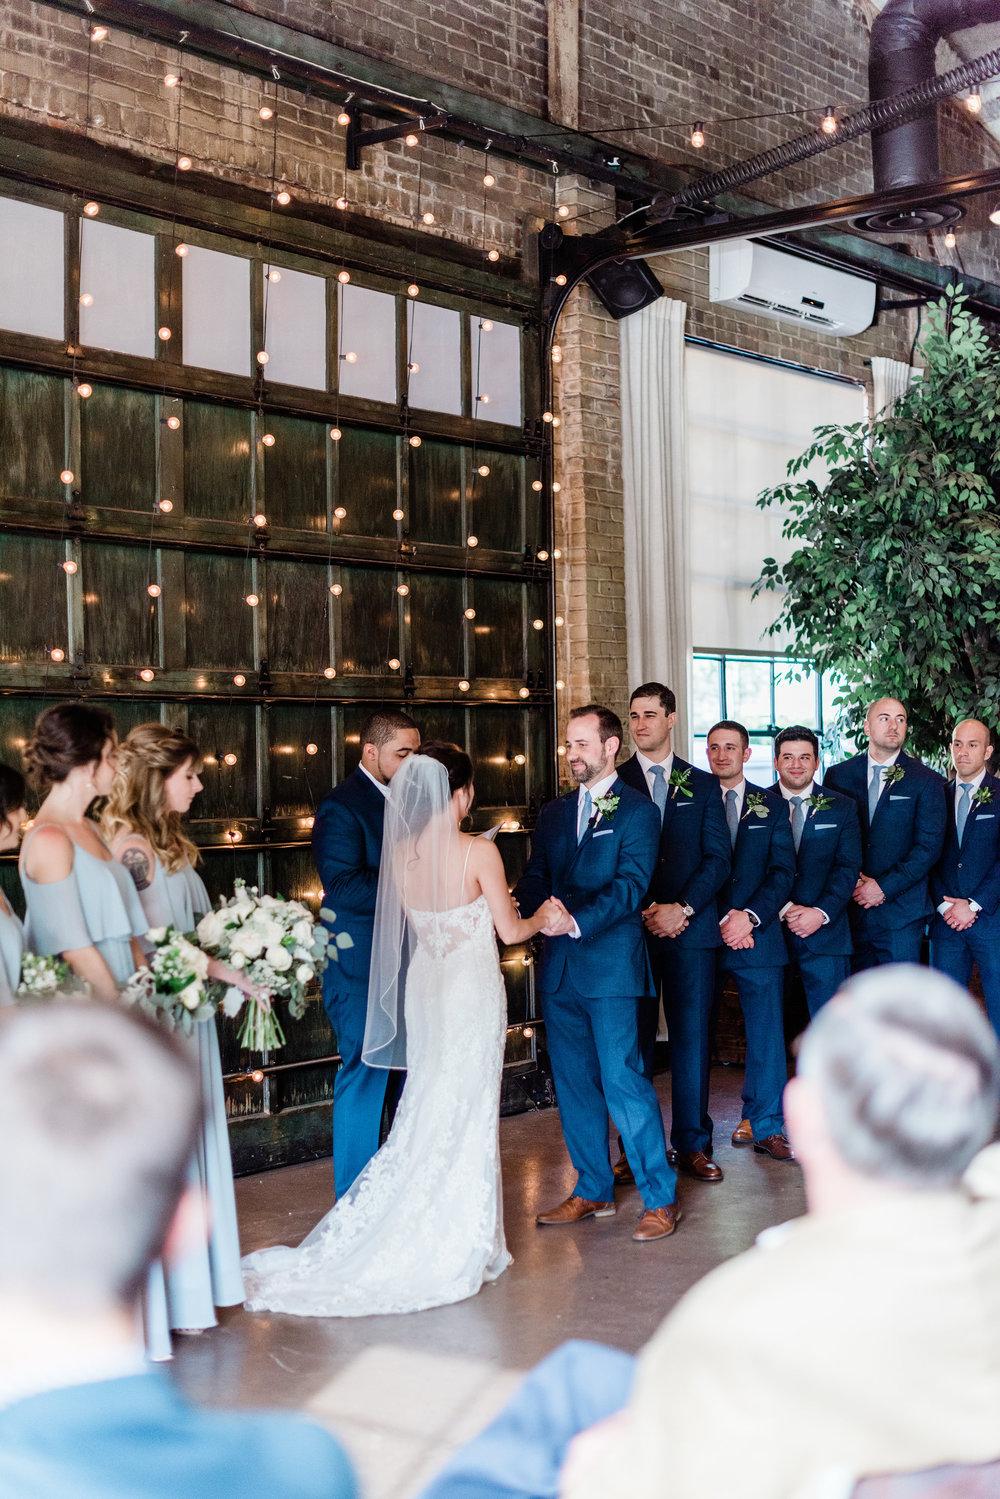 savannah-bridal-shop-savannah-florist-savannah-wedding-planner-michelle-and-scott-apt-b-photography-soho-south-cafe-wedding-downtown-savannah-wedding-39.JPG